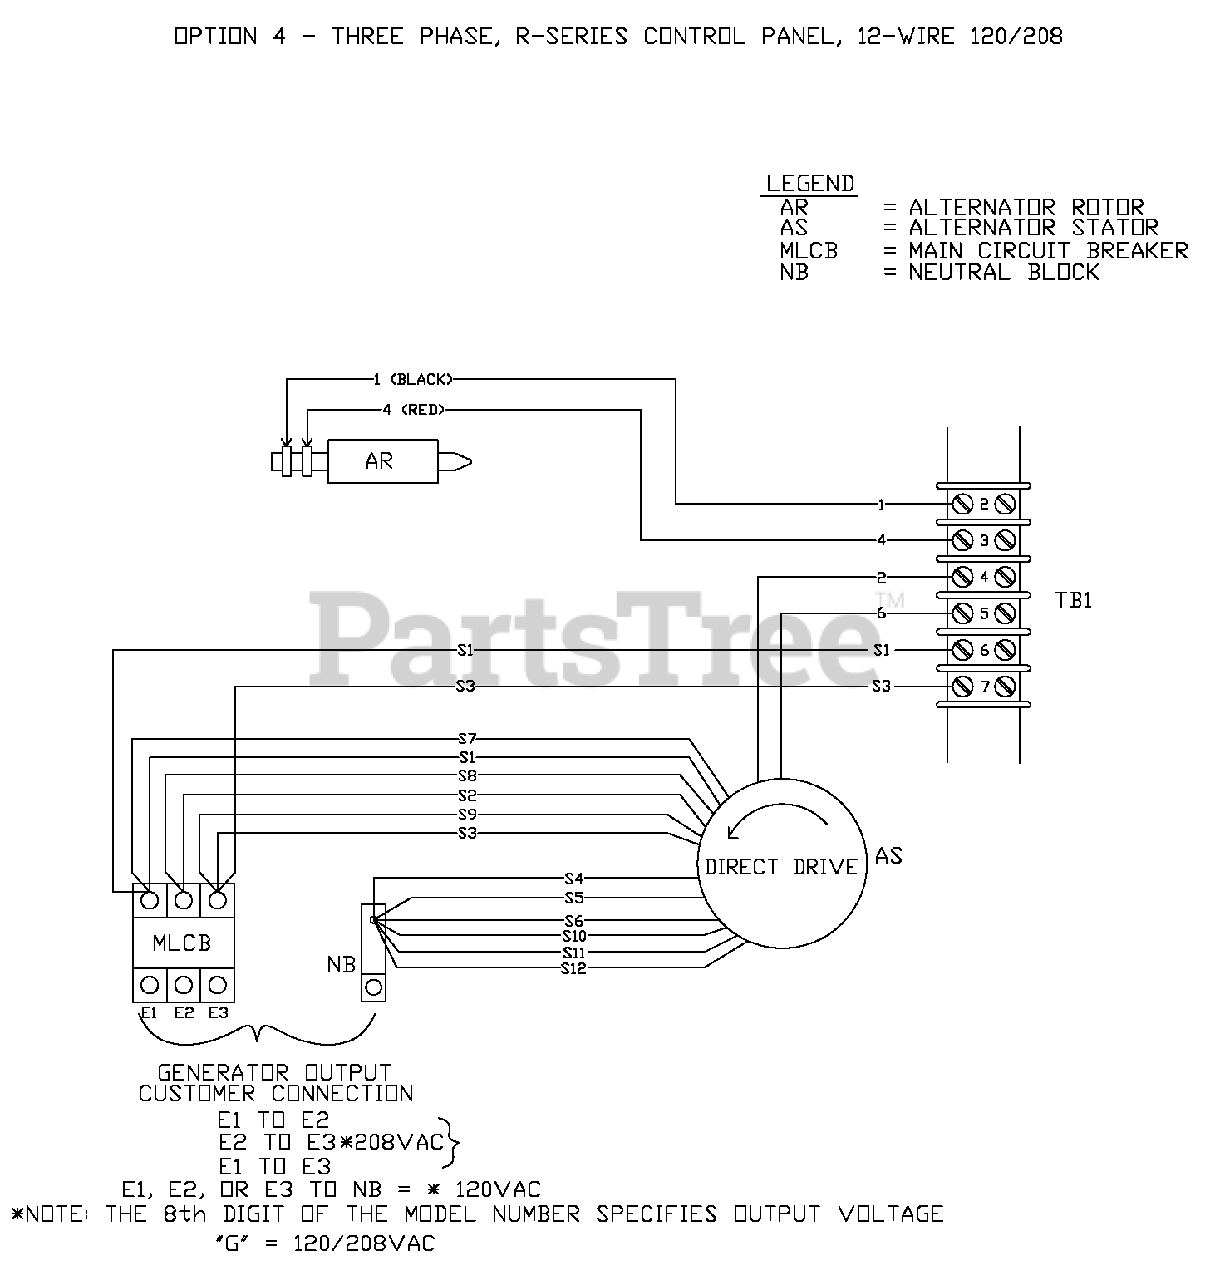 Generac 22kw Home Standby Generator Sn